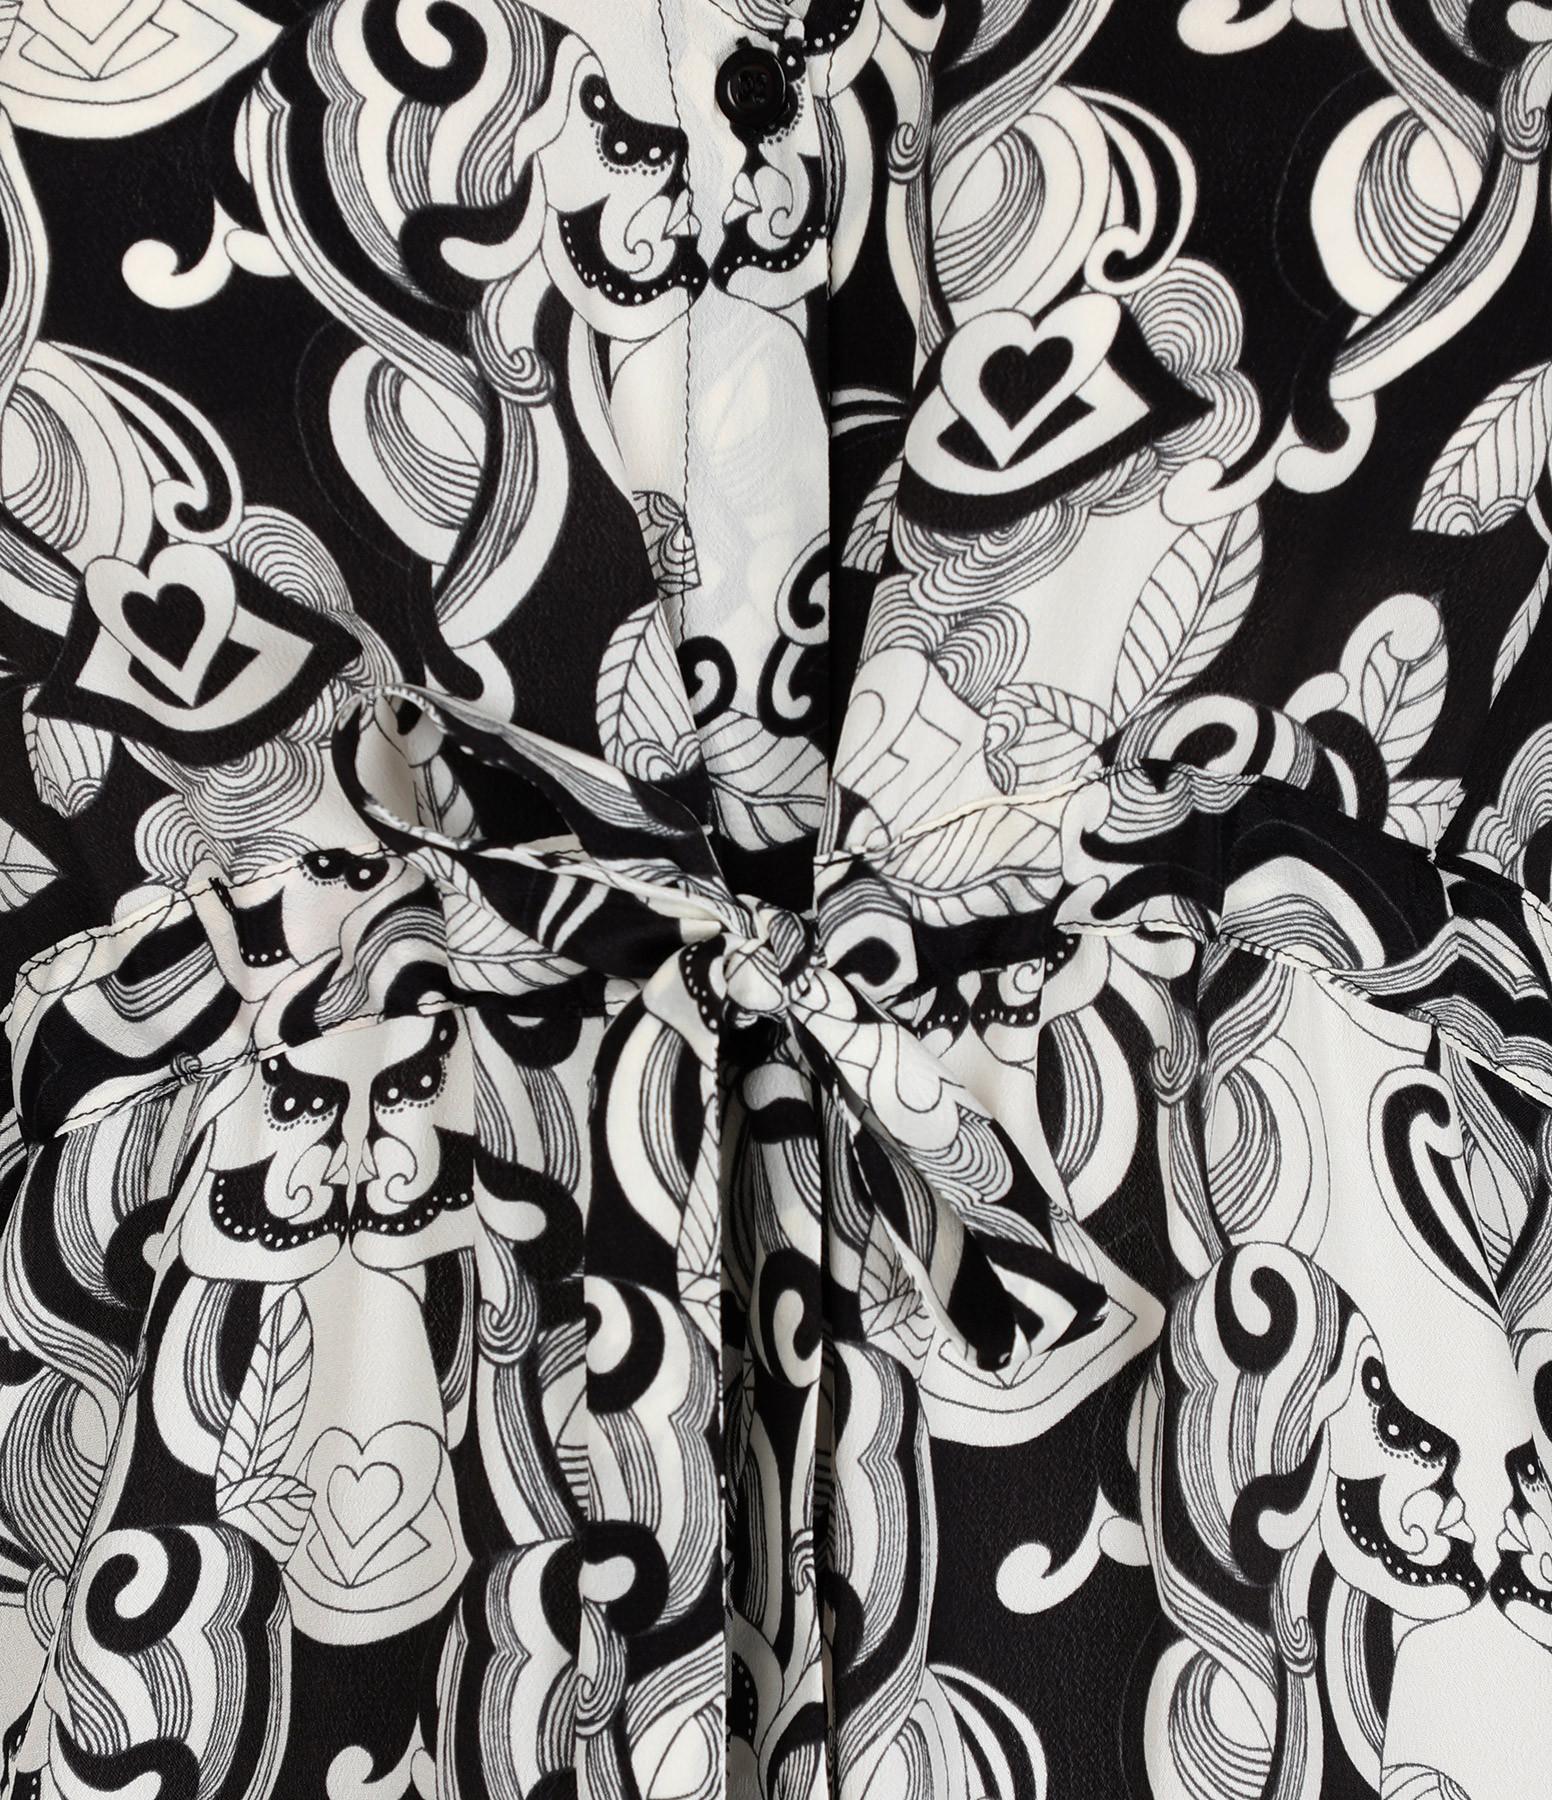 SEE BY CHLOE - Robe Longue Imprimé Noir Blanc